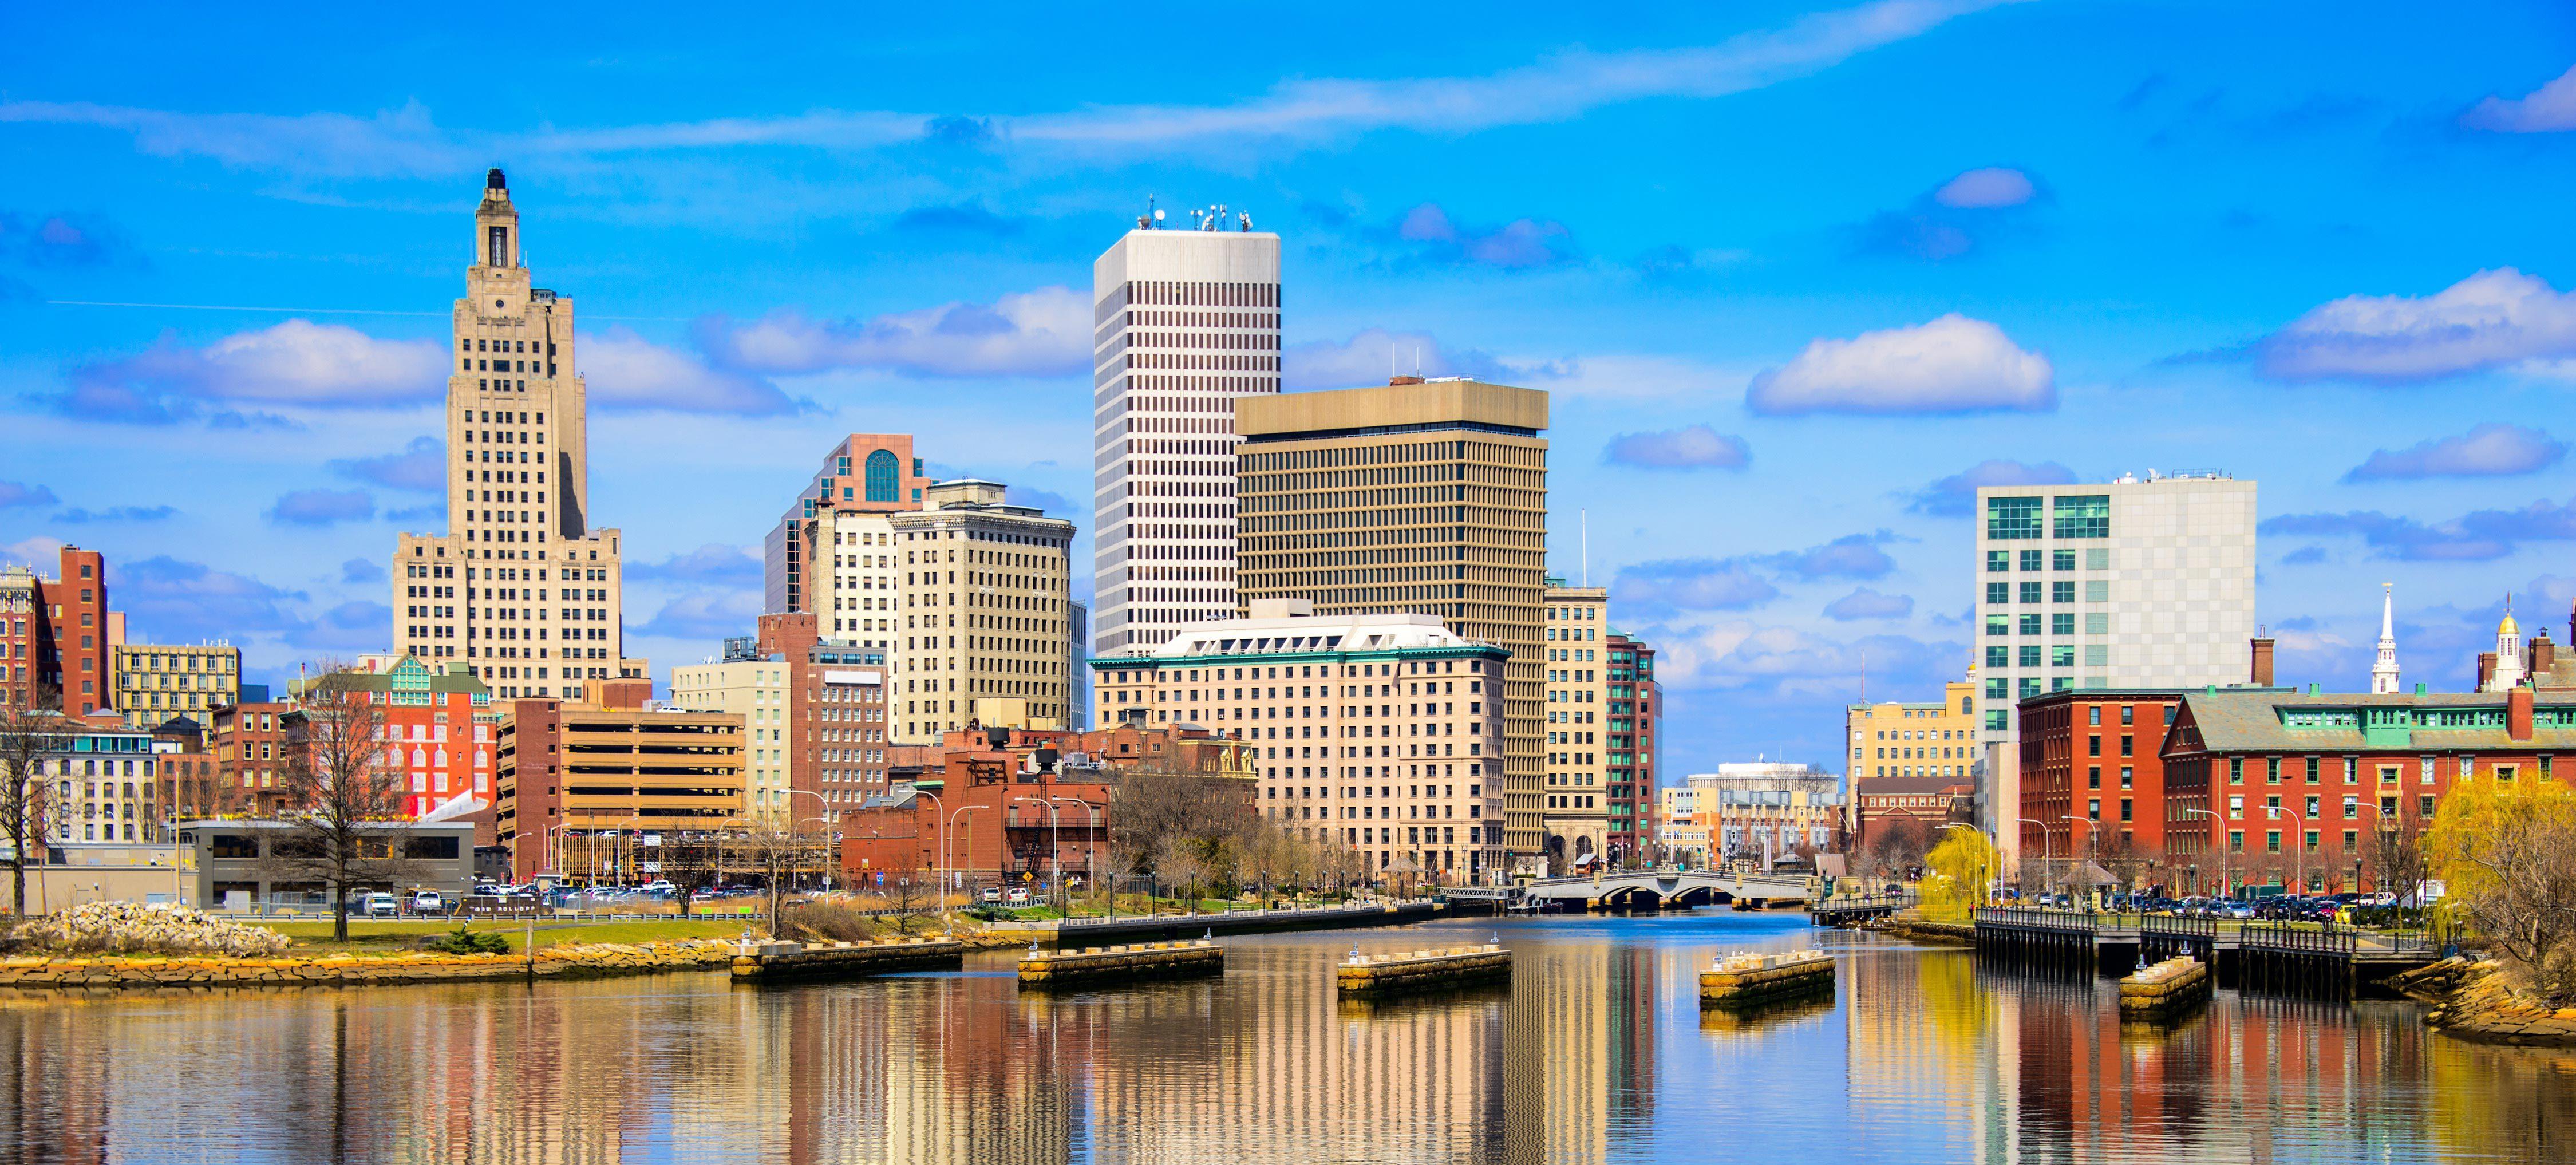 Providence, RI image